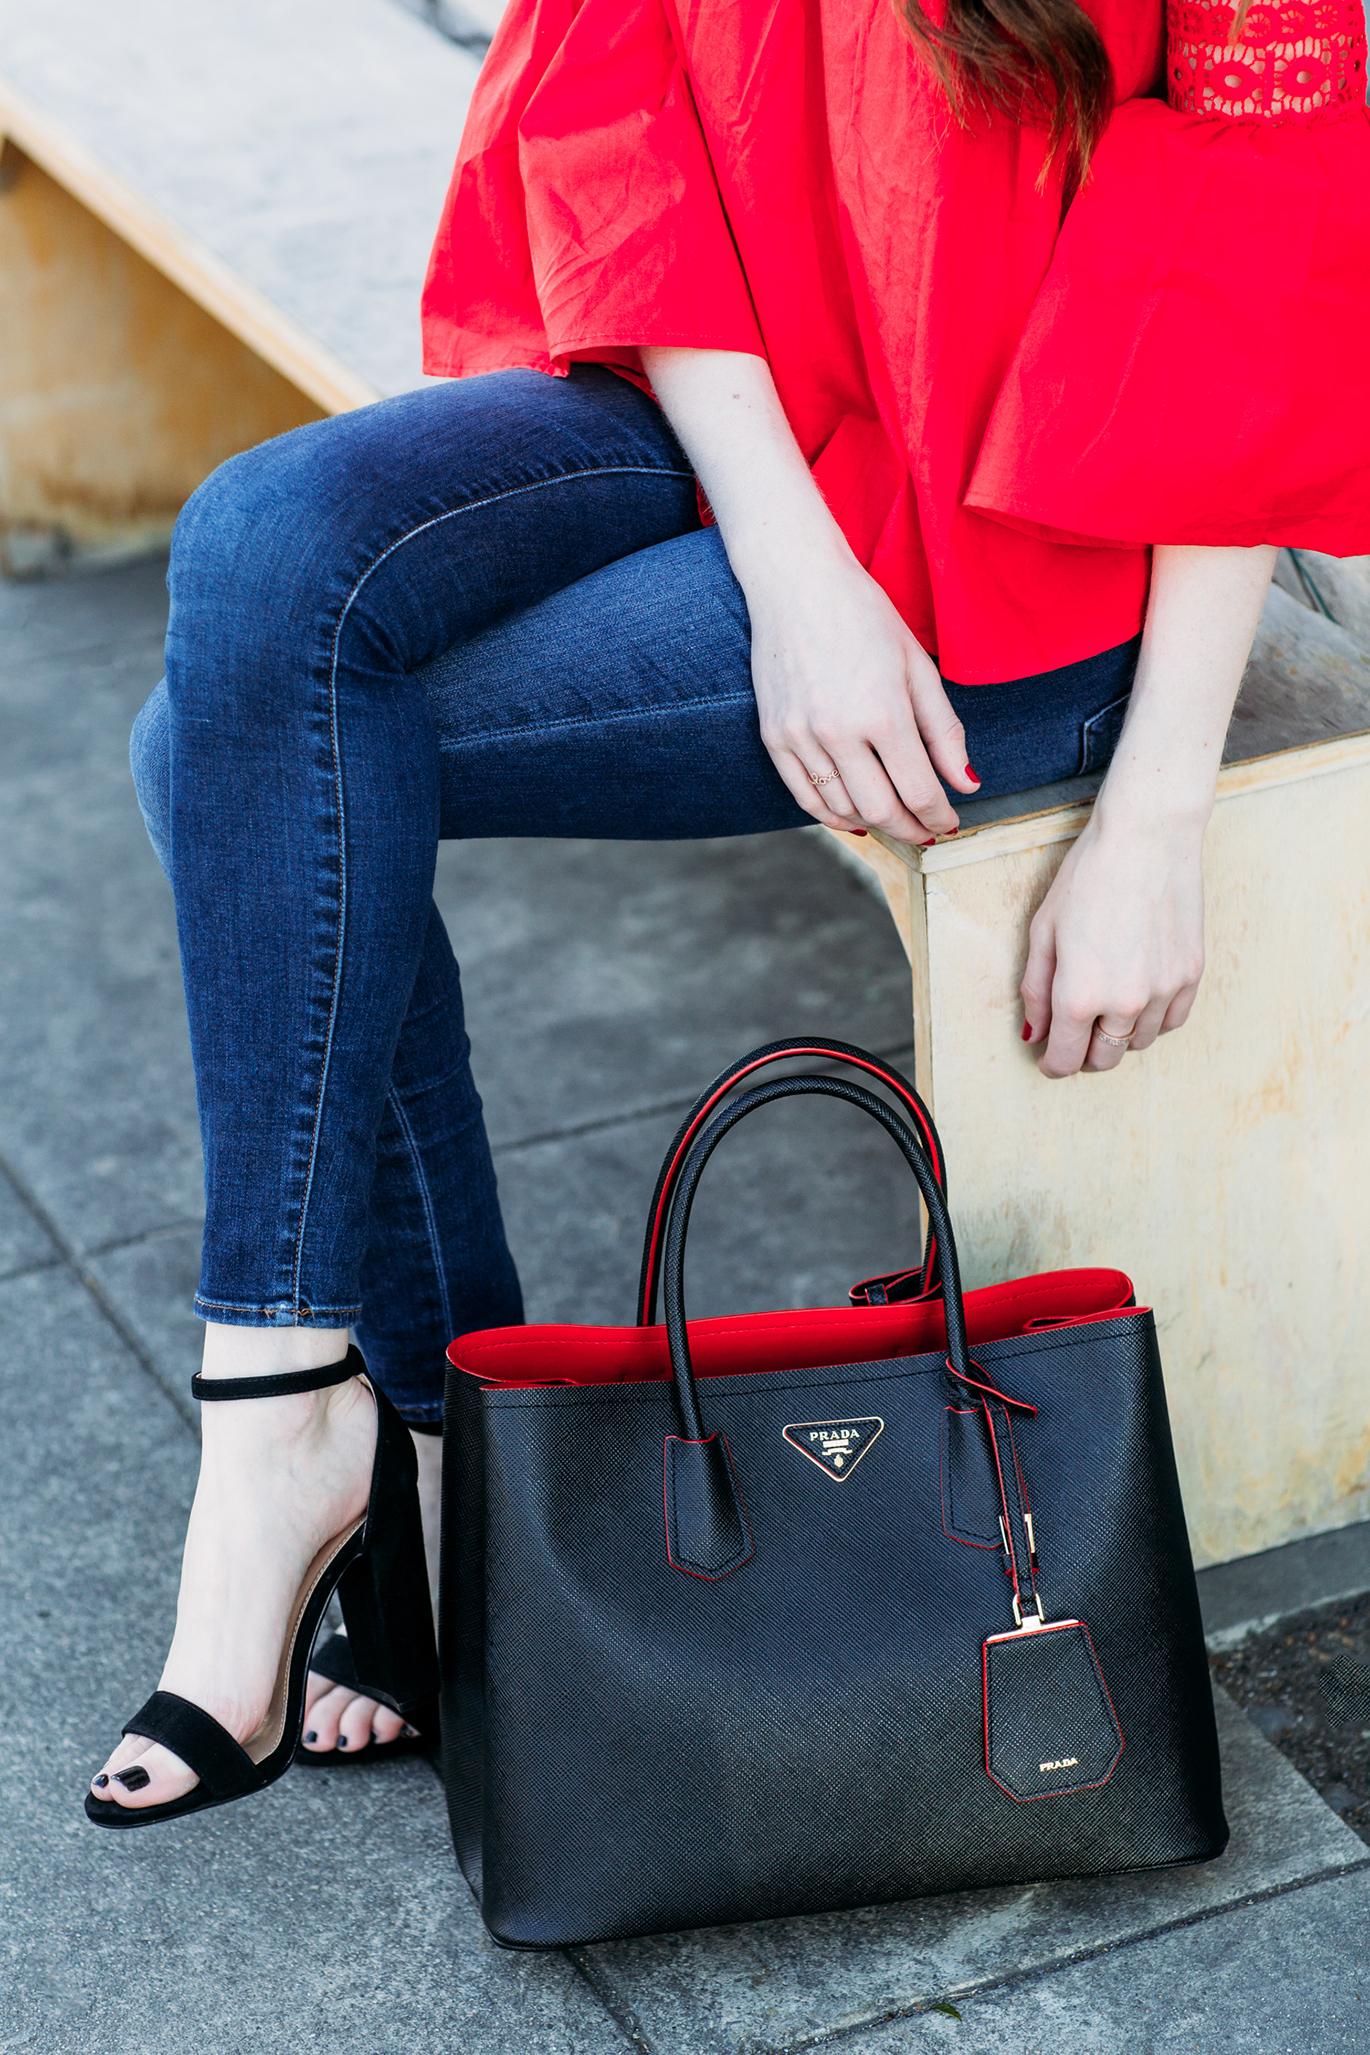 Black Prada purse with red lining